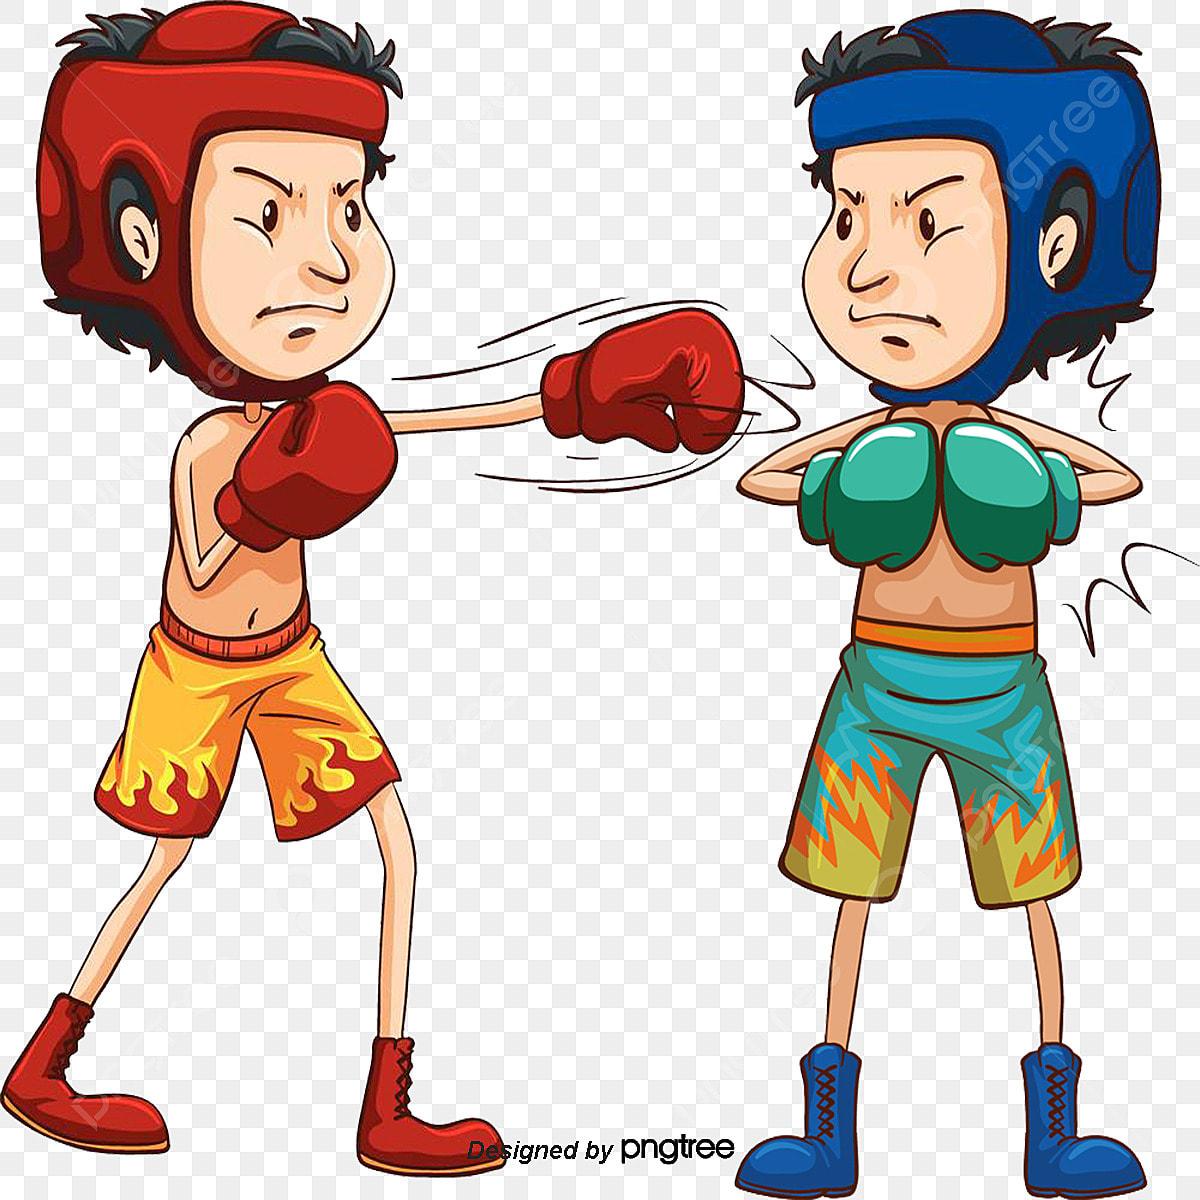 картинки профессии боксер помимо